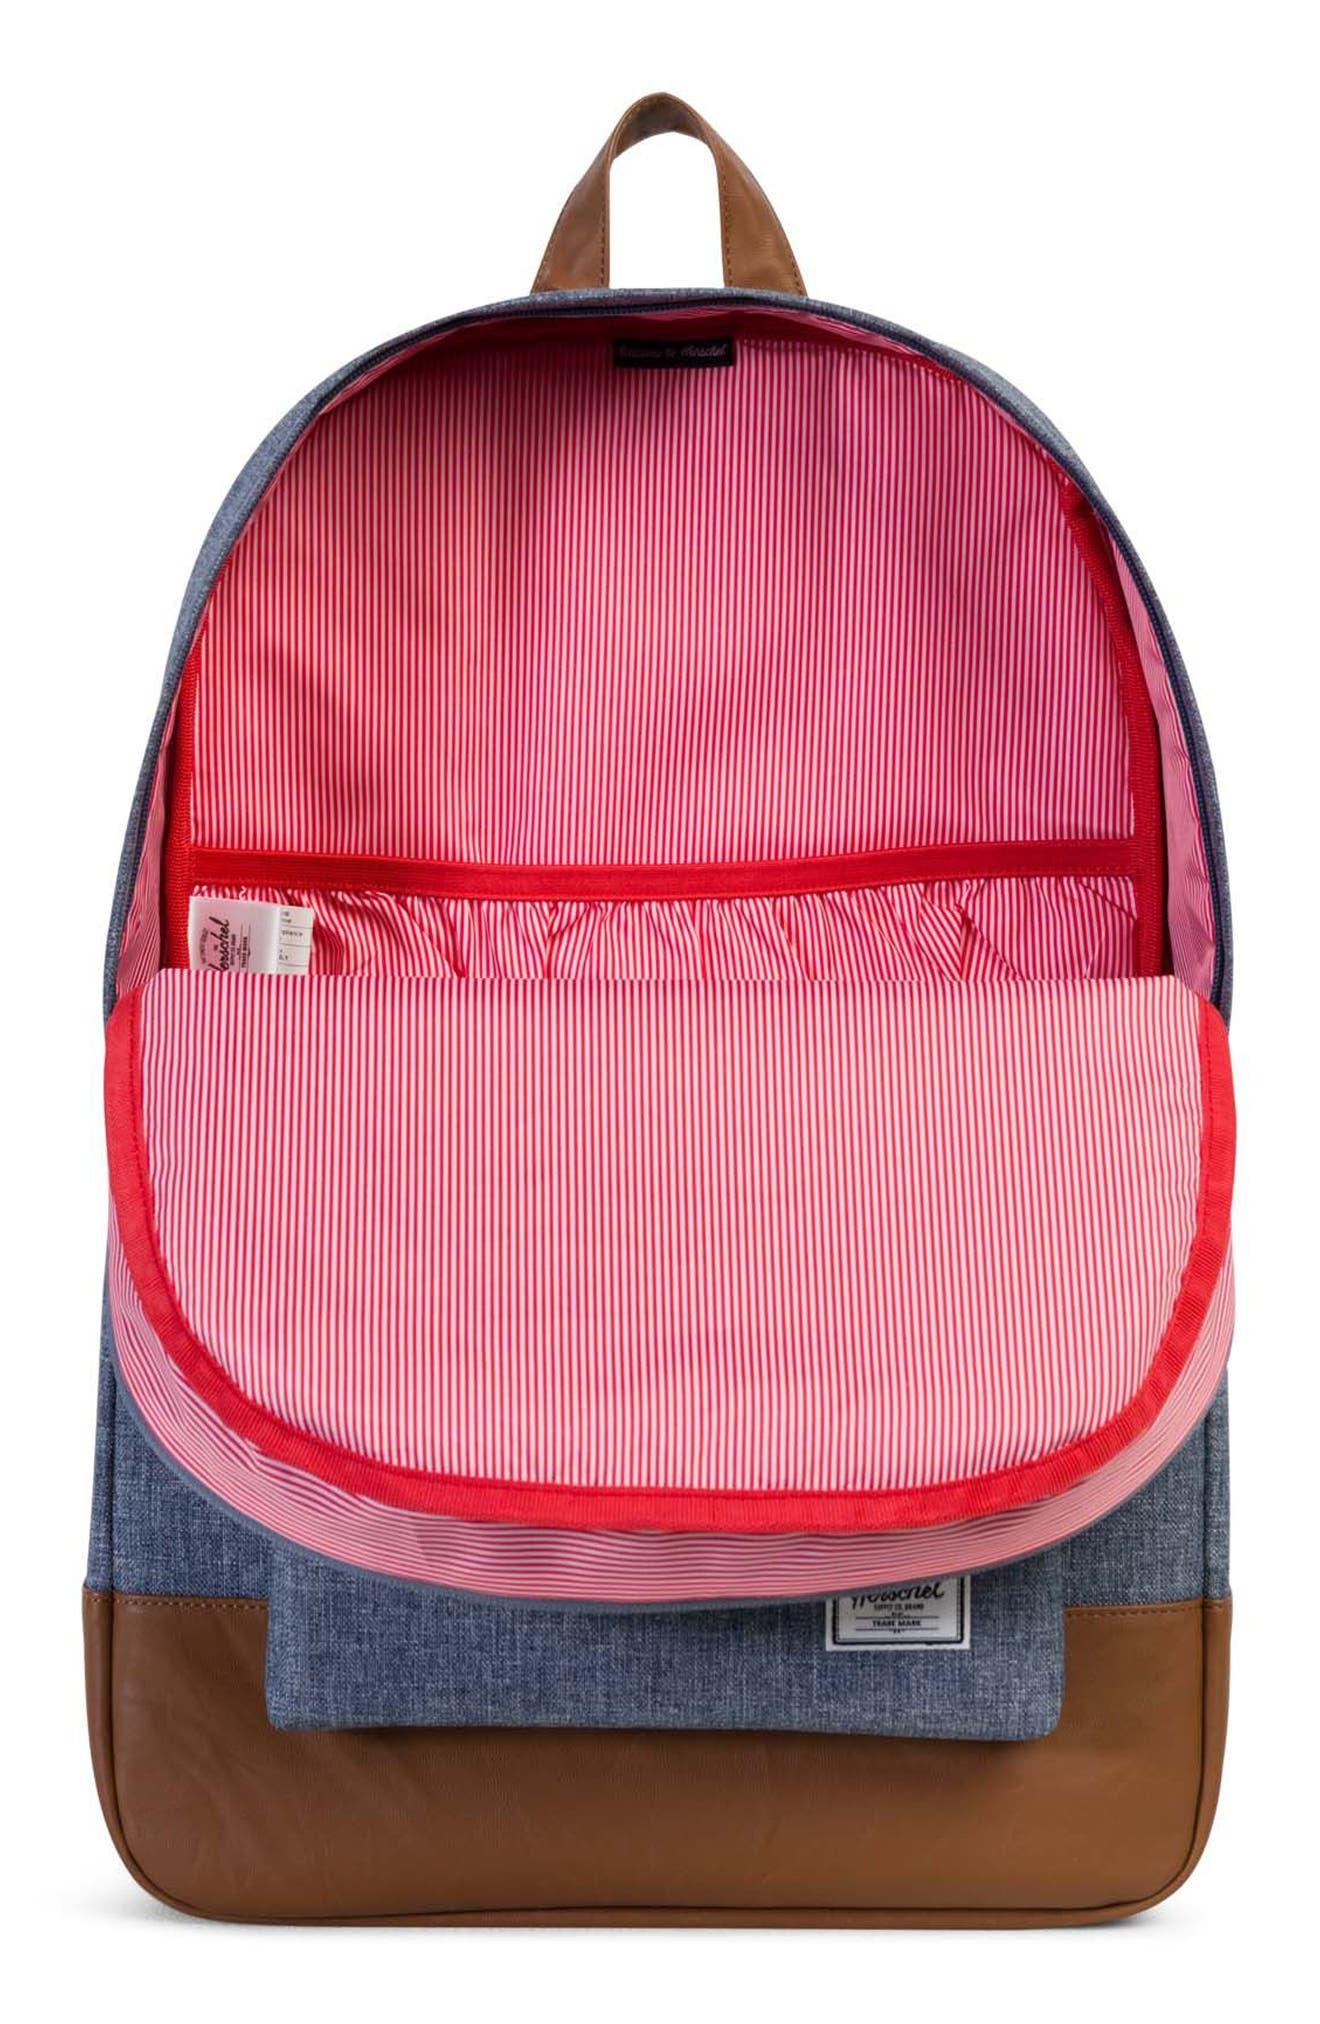 Heritage Backpack,                             Alternate thumbnail 3, color,                             Dark Blue Crosshatch/ Tan